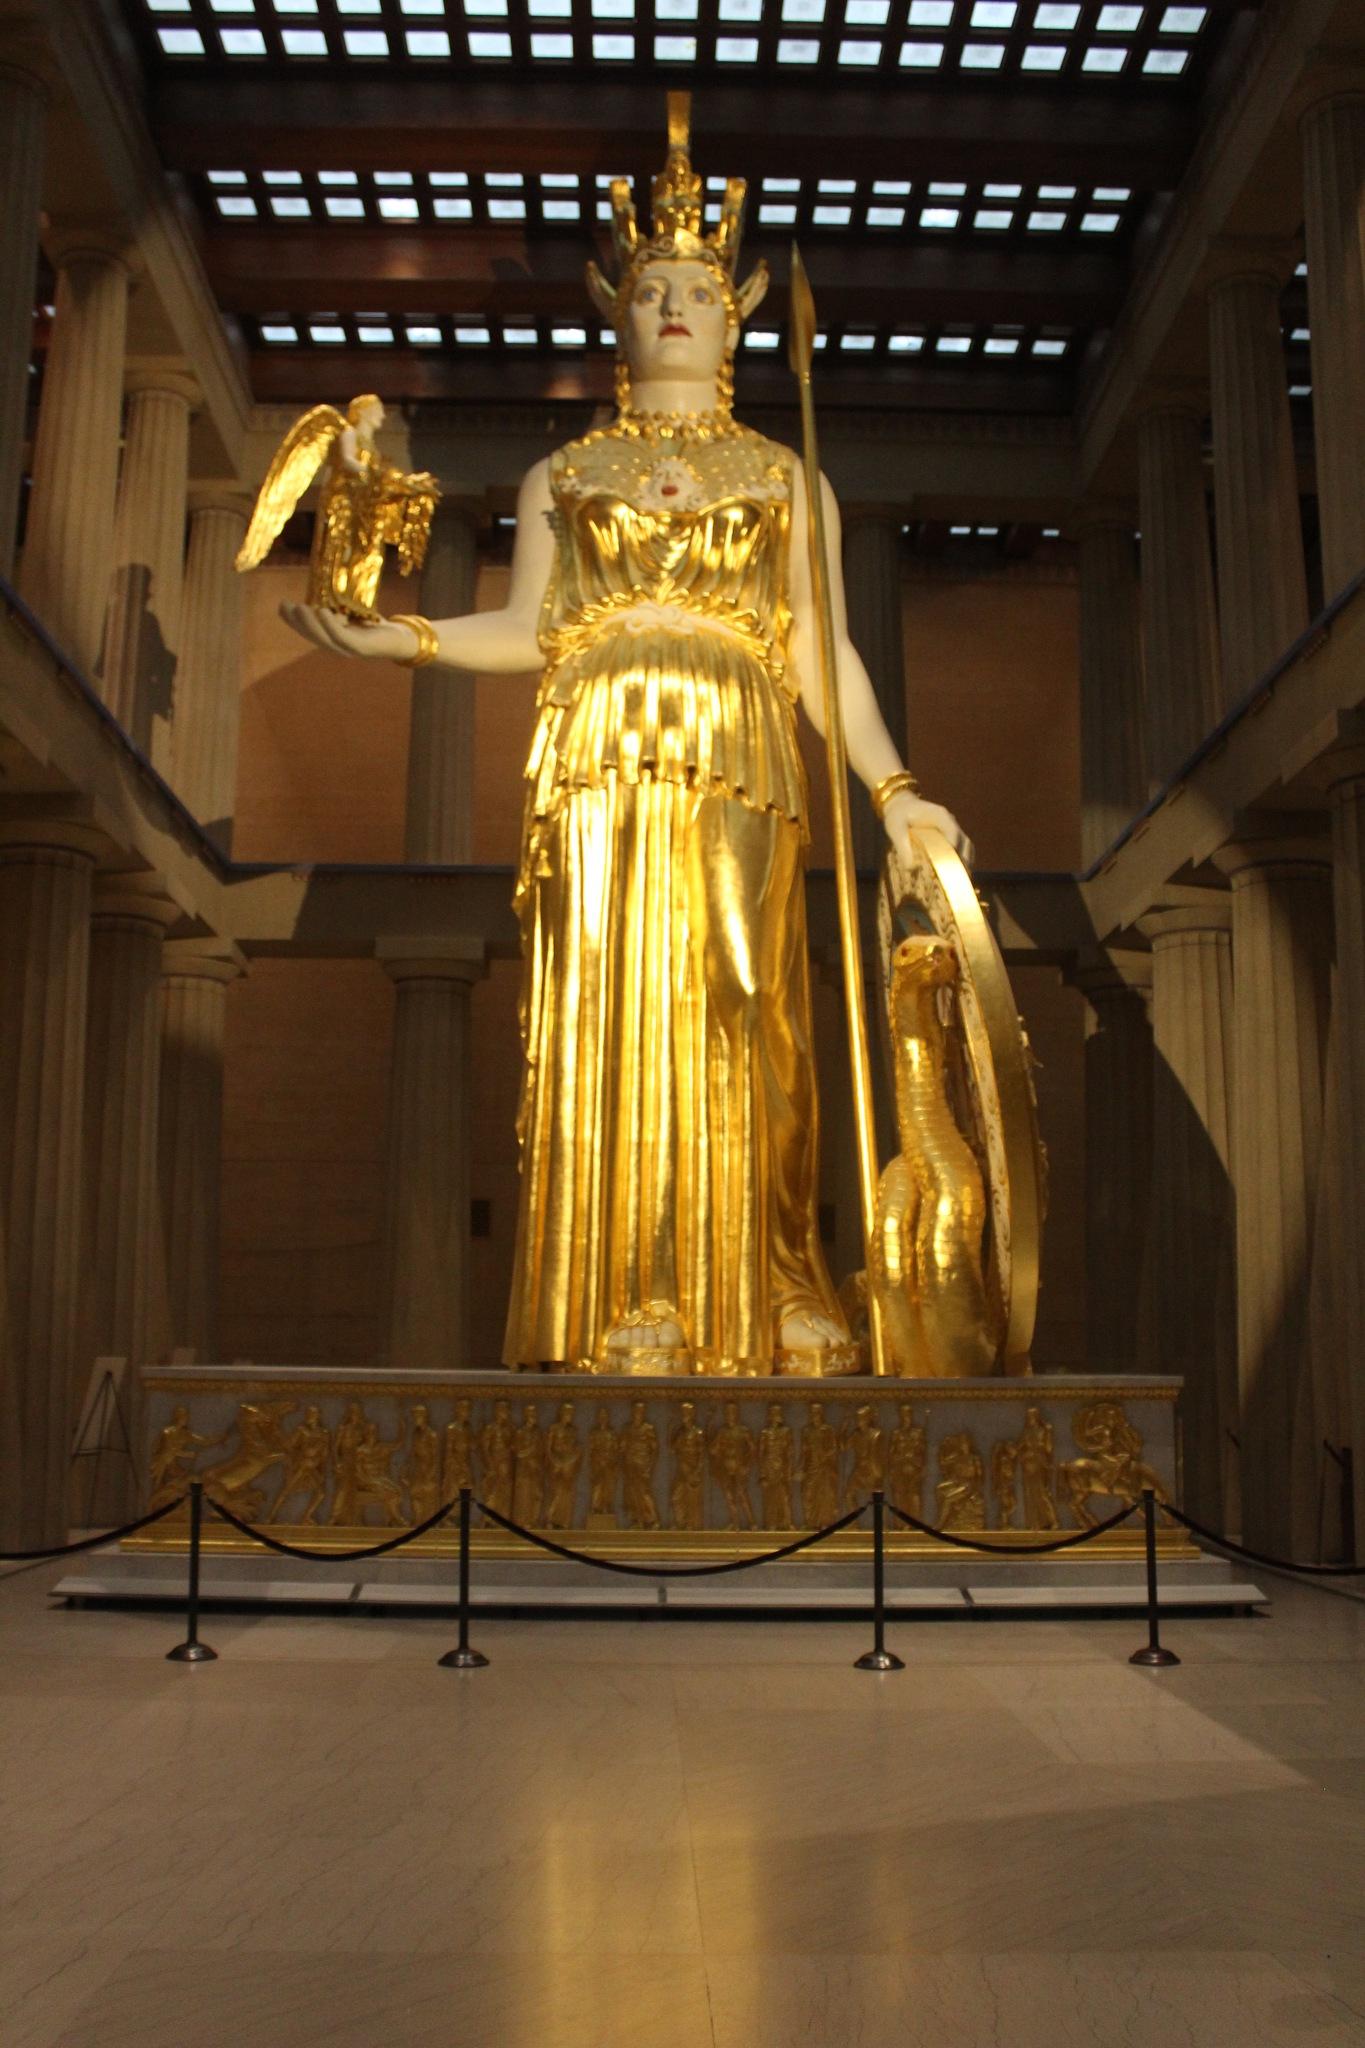 Athena The Goddess of Wisdom, War & Craft by Michael Glaze, Jr.